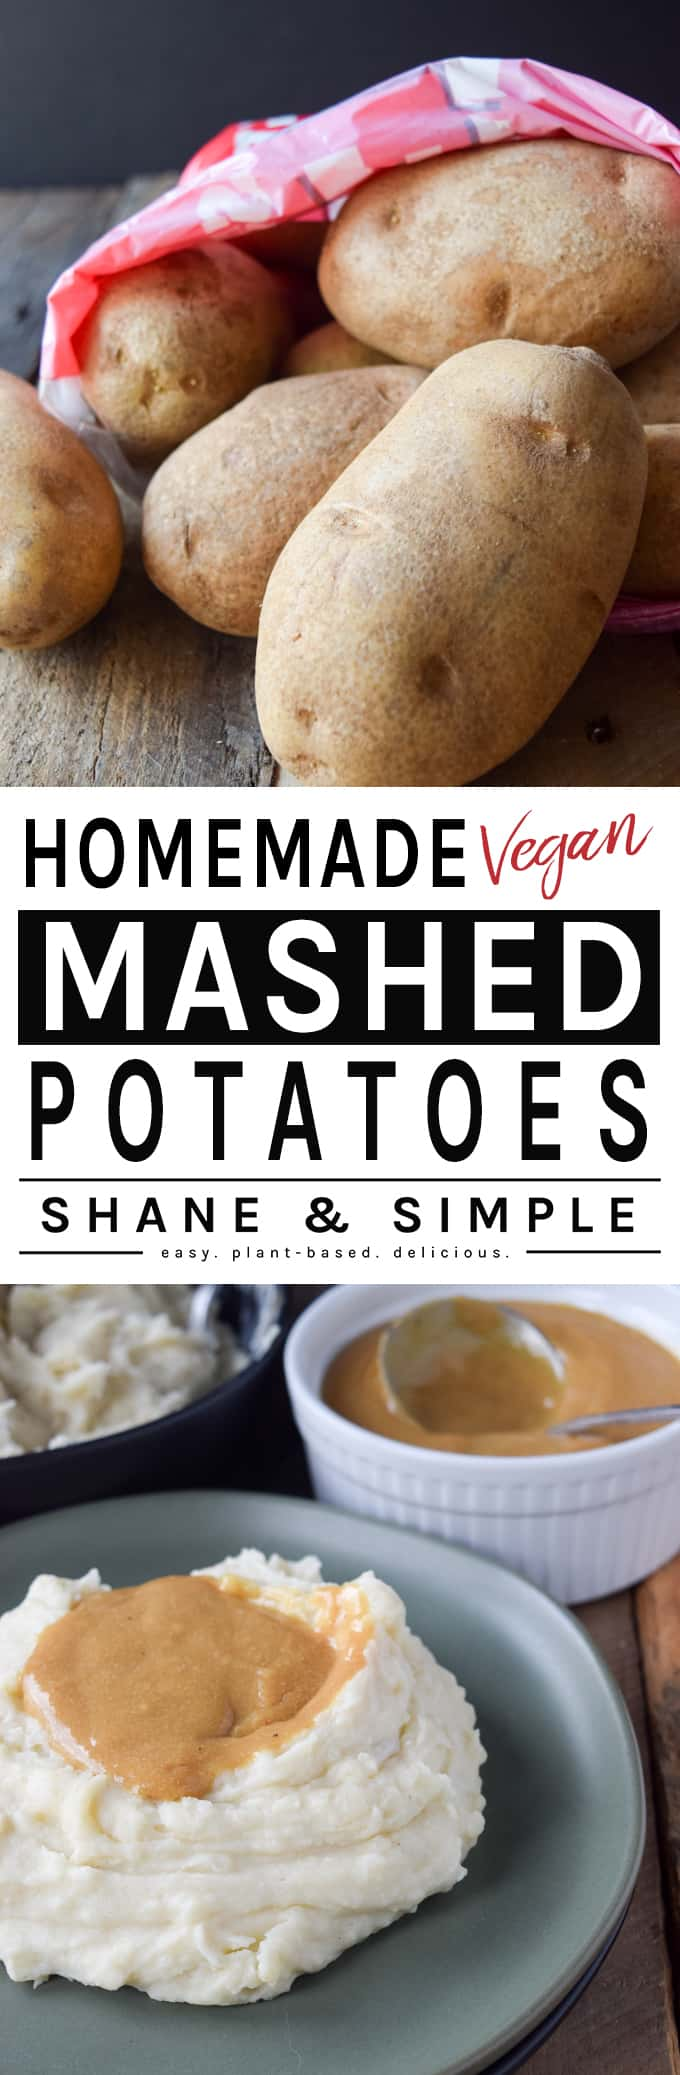 Real Creamy Homemade Vegan Mashed Potatoes